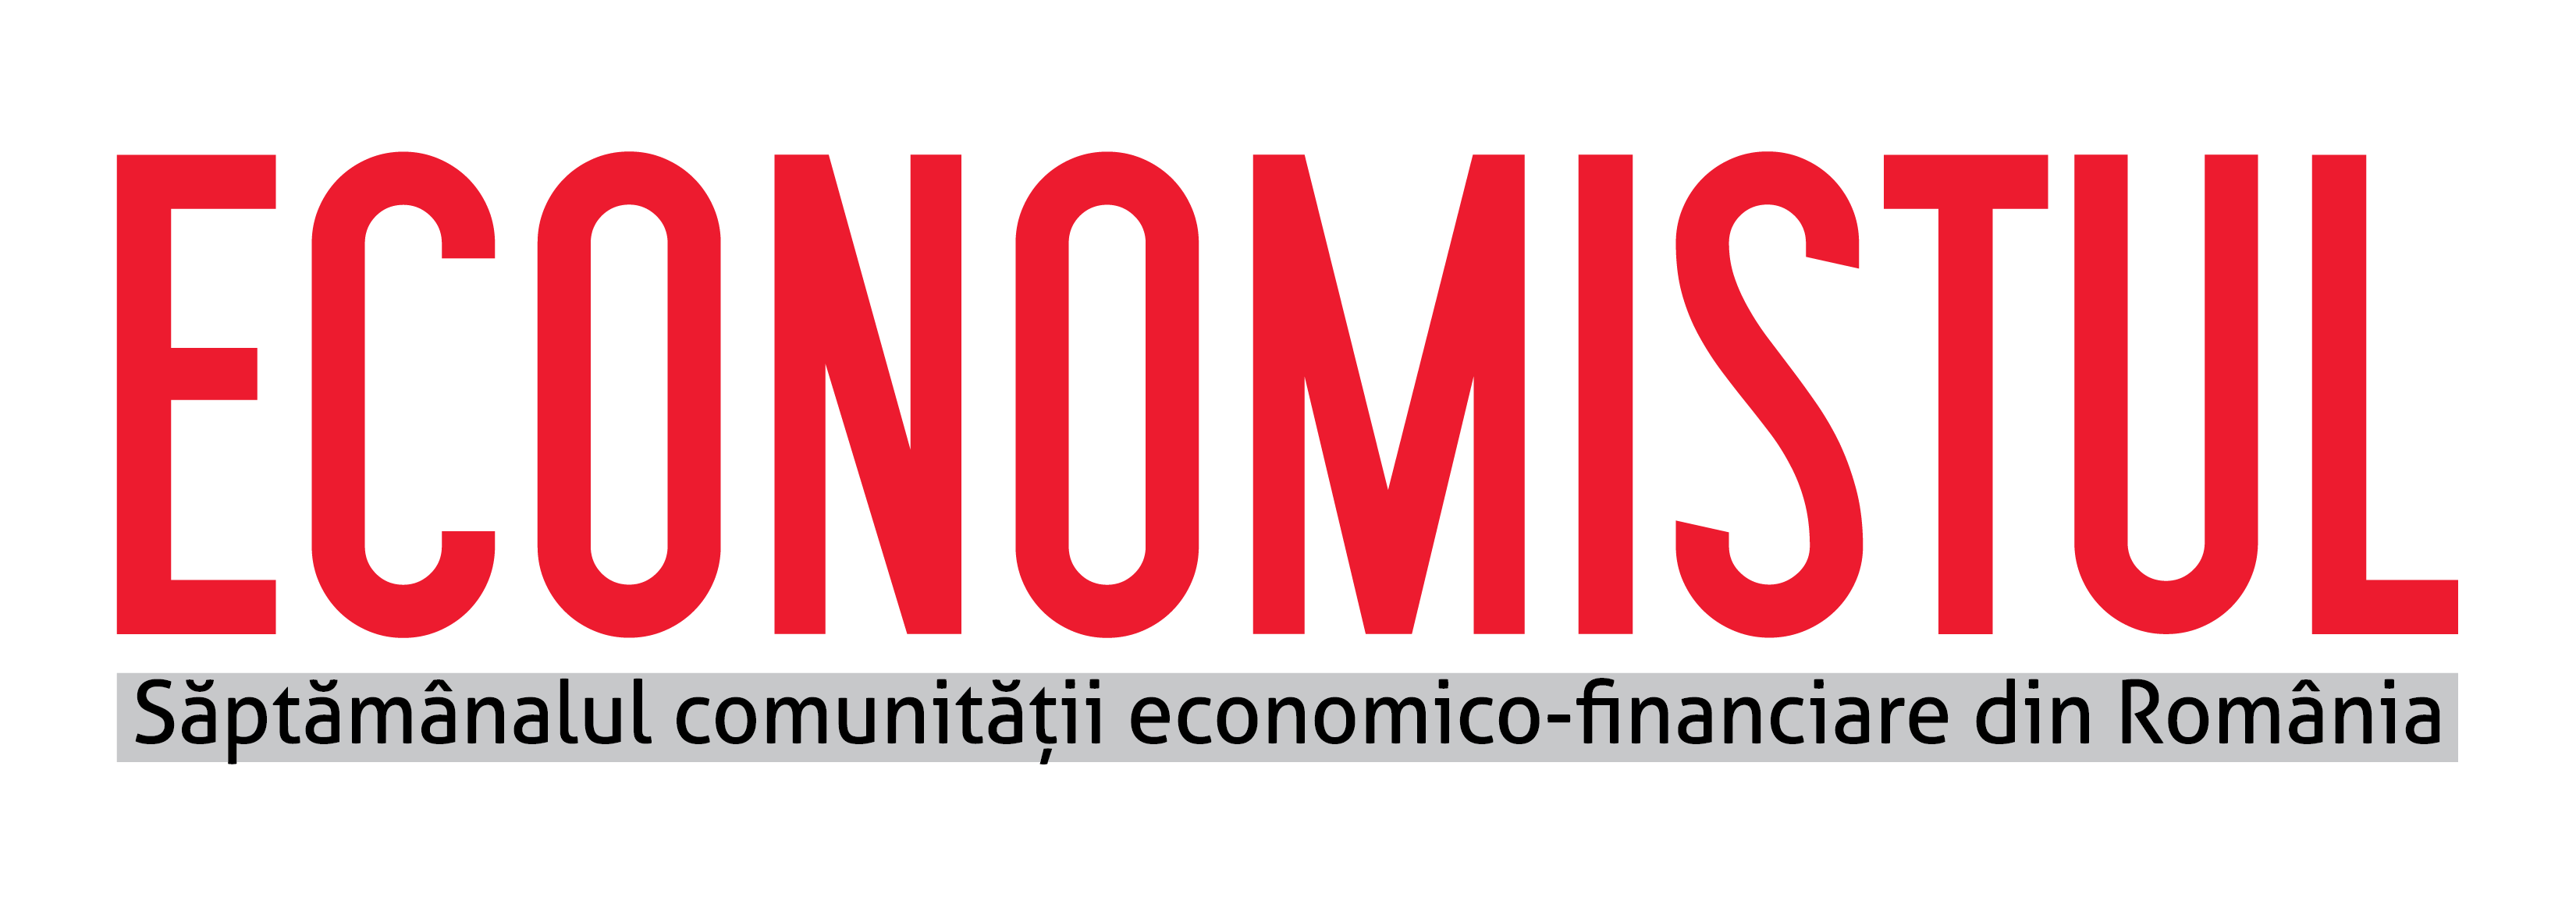 logo Economistul rosu